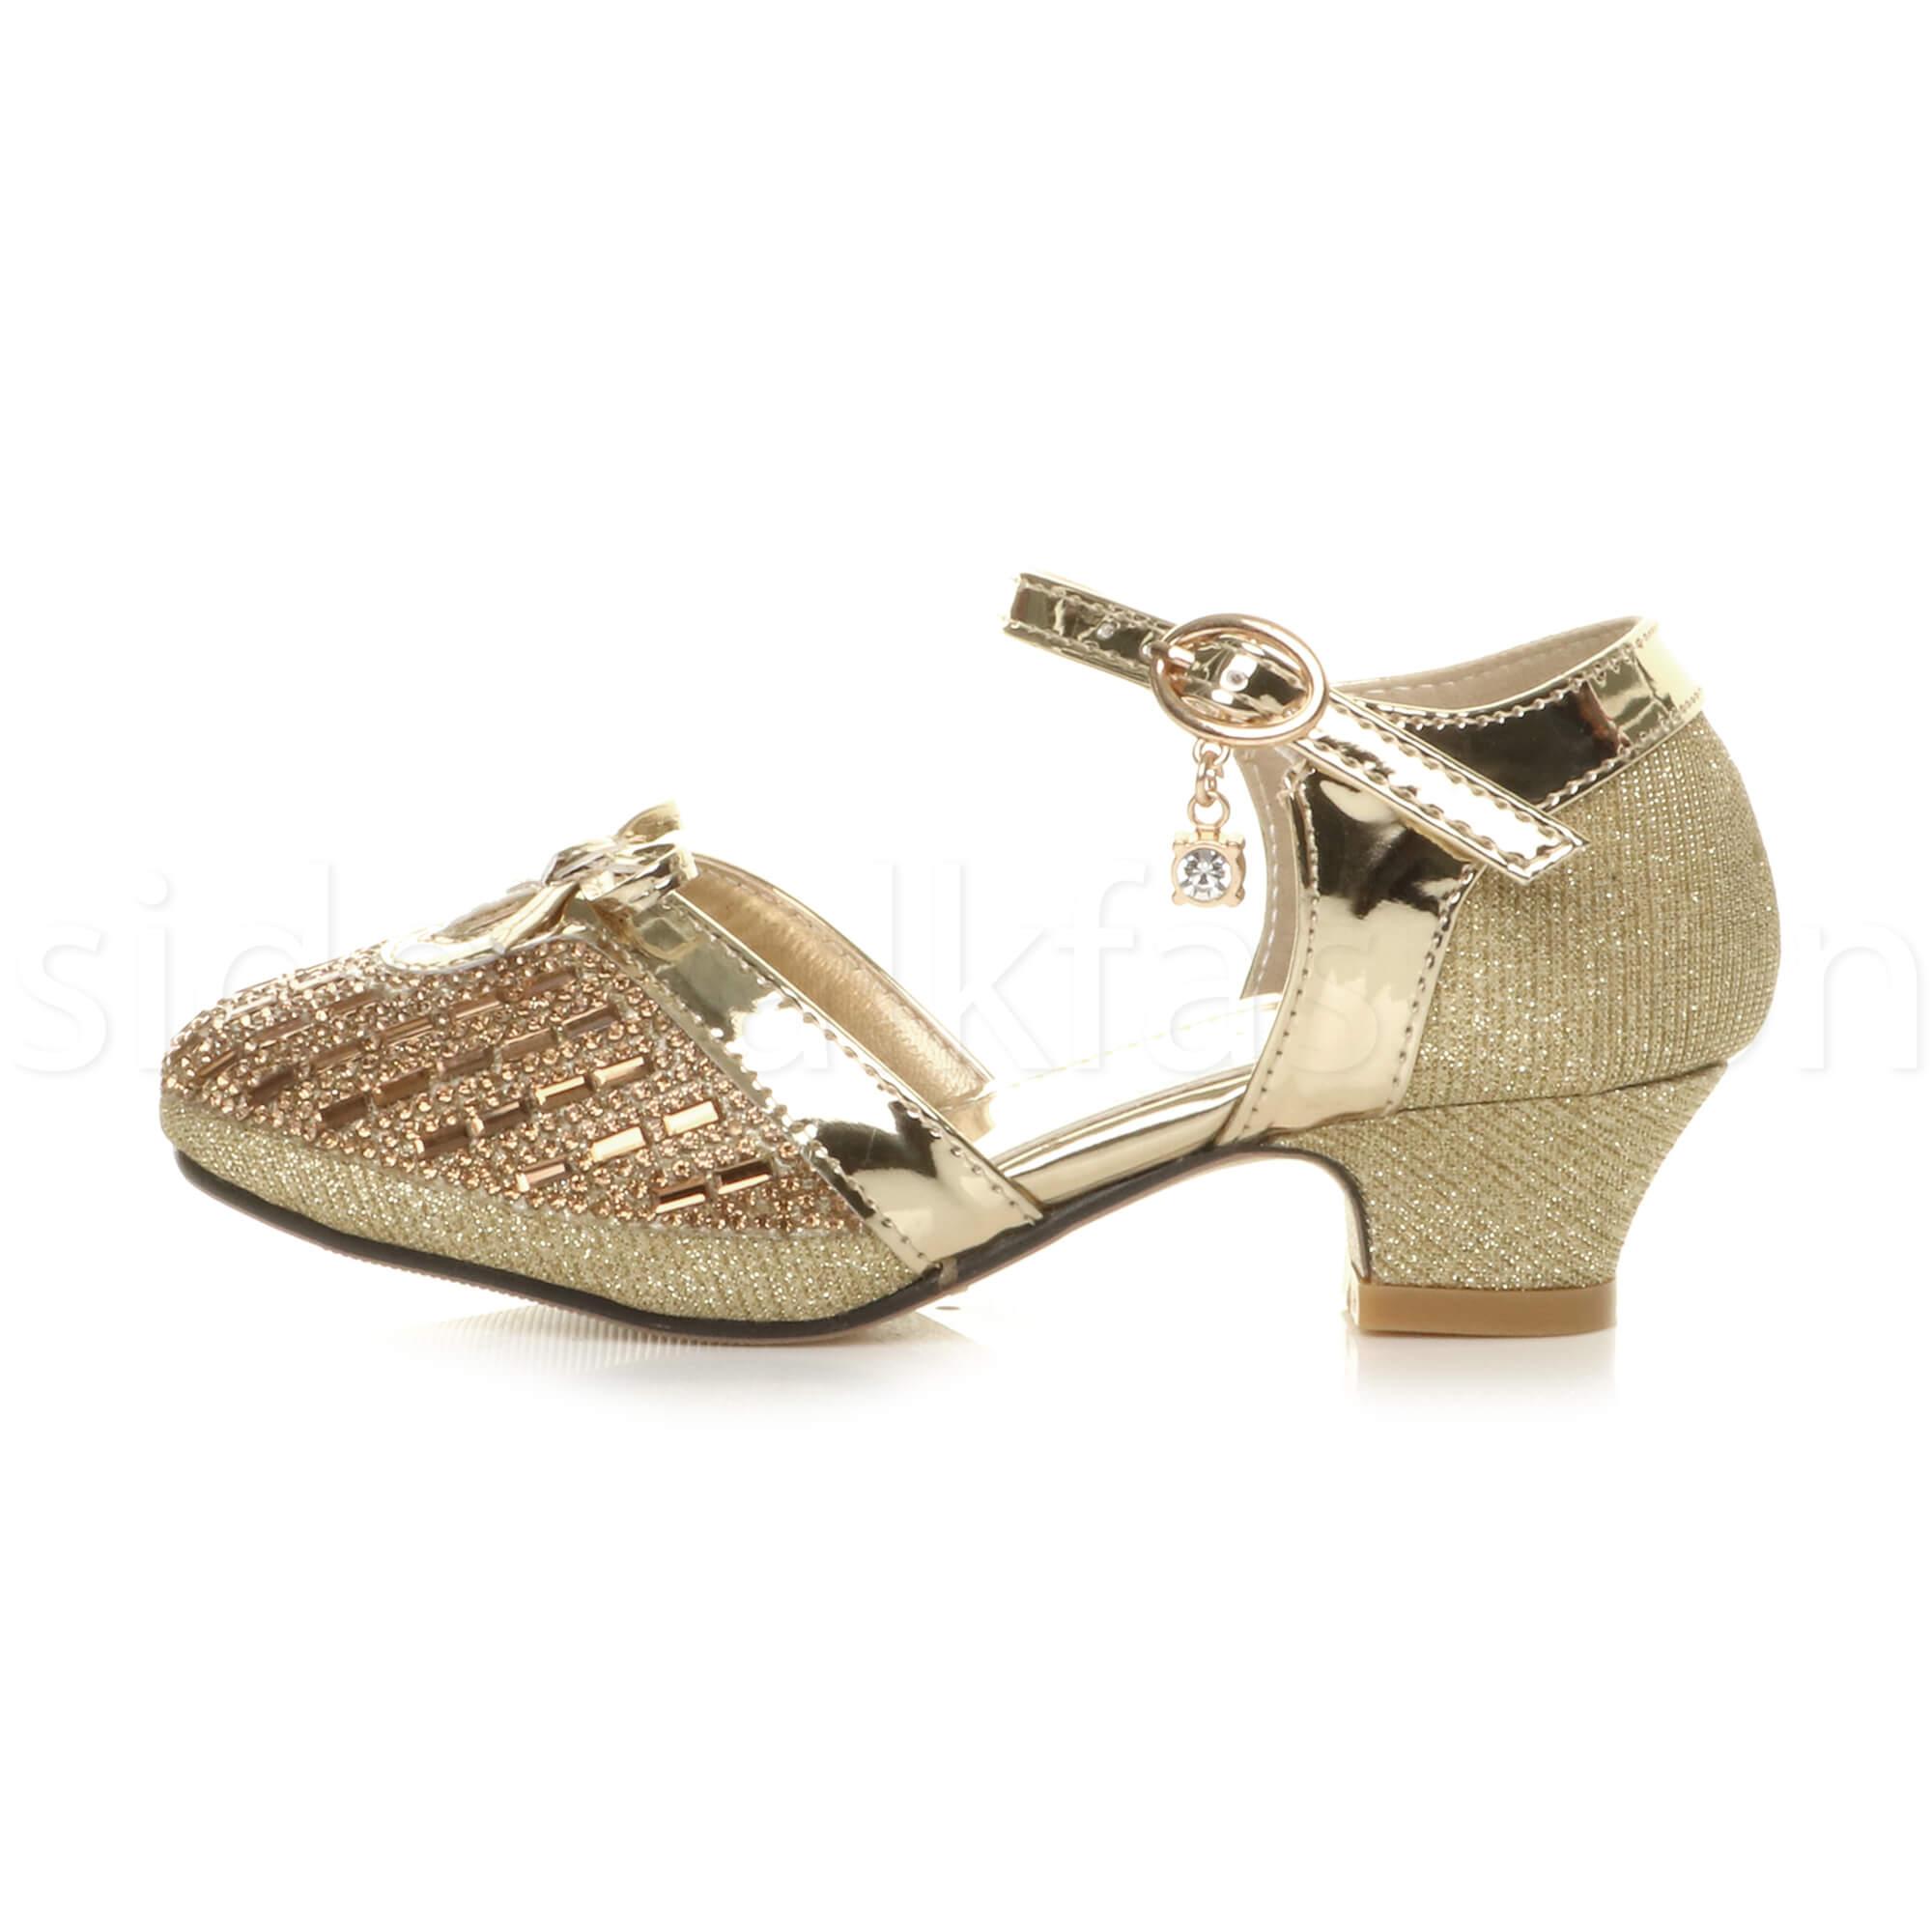 Girls kids childrens low heel bridesmaid princess sandals diamante court shoes